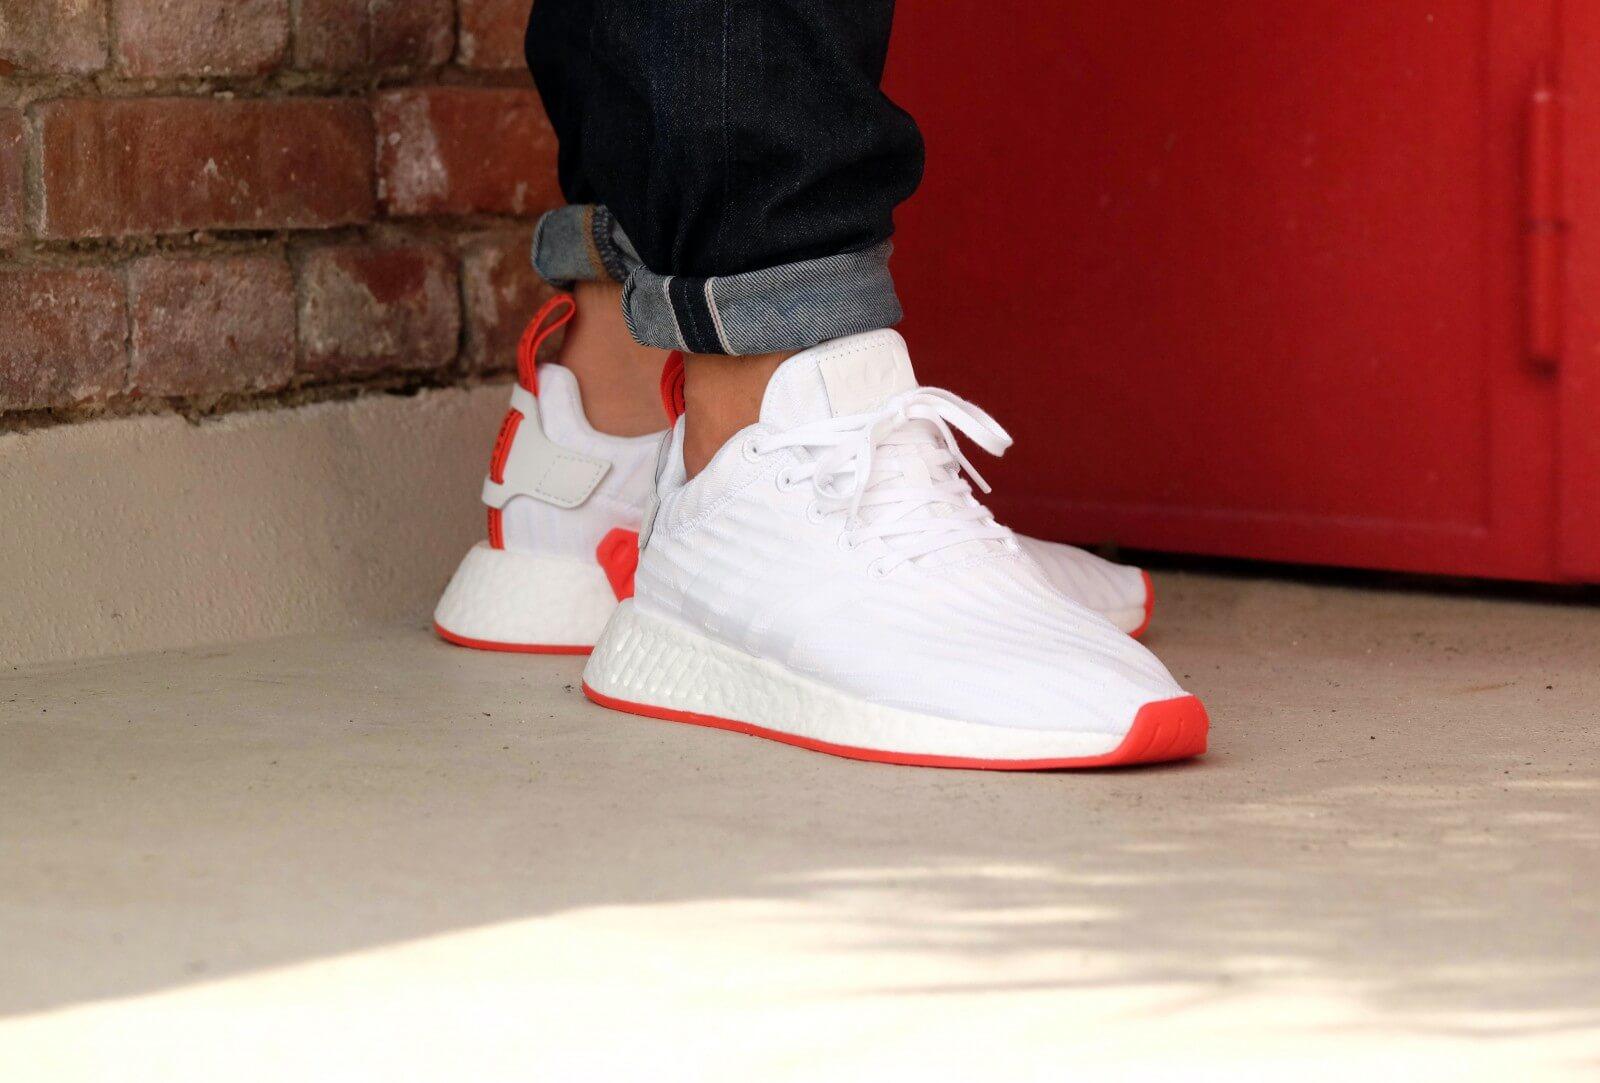 Adidas Nmd R2 Pk Footwear White Core Red Ba7253